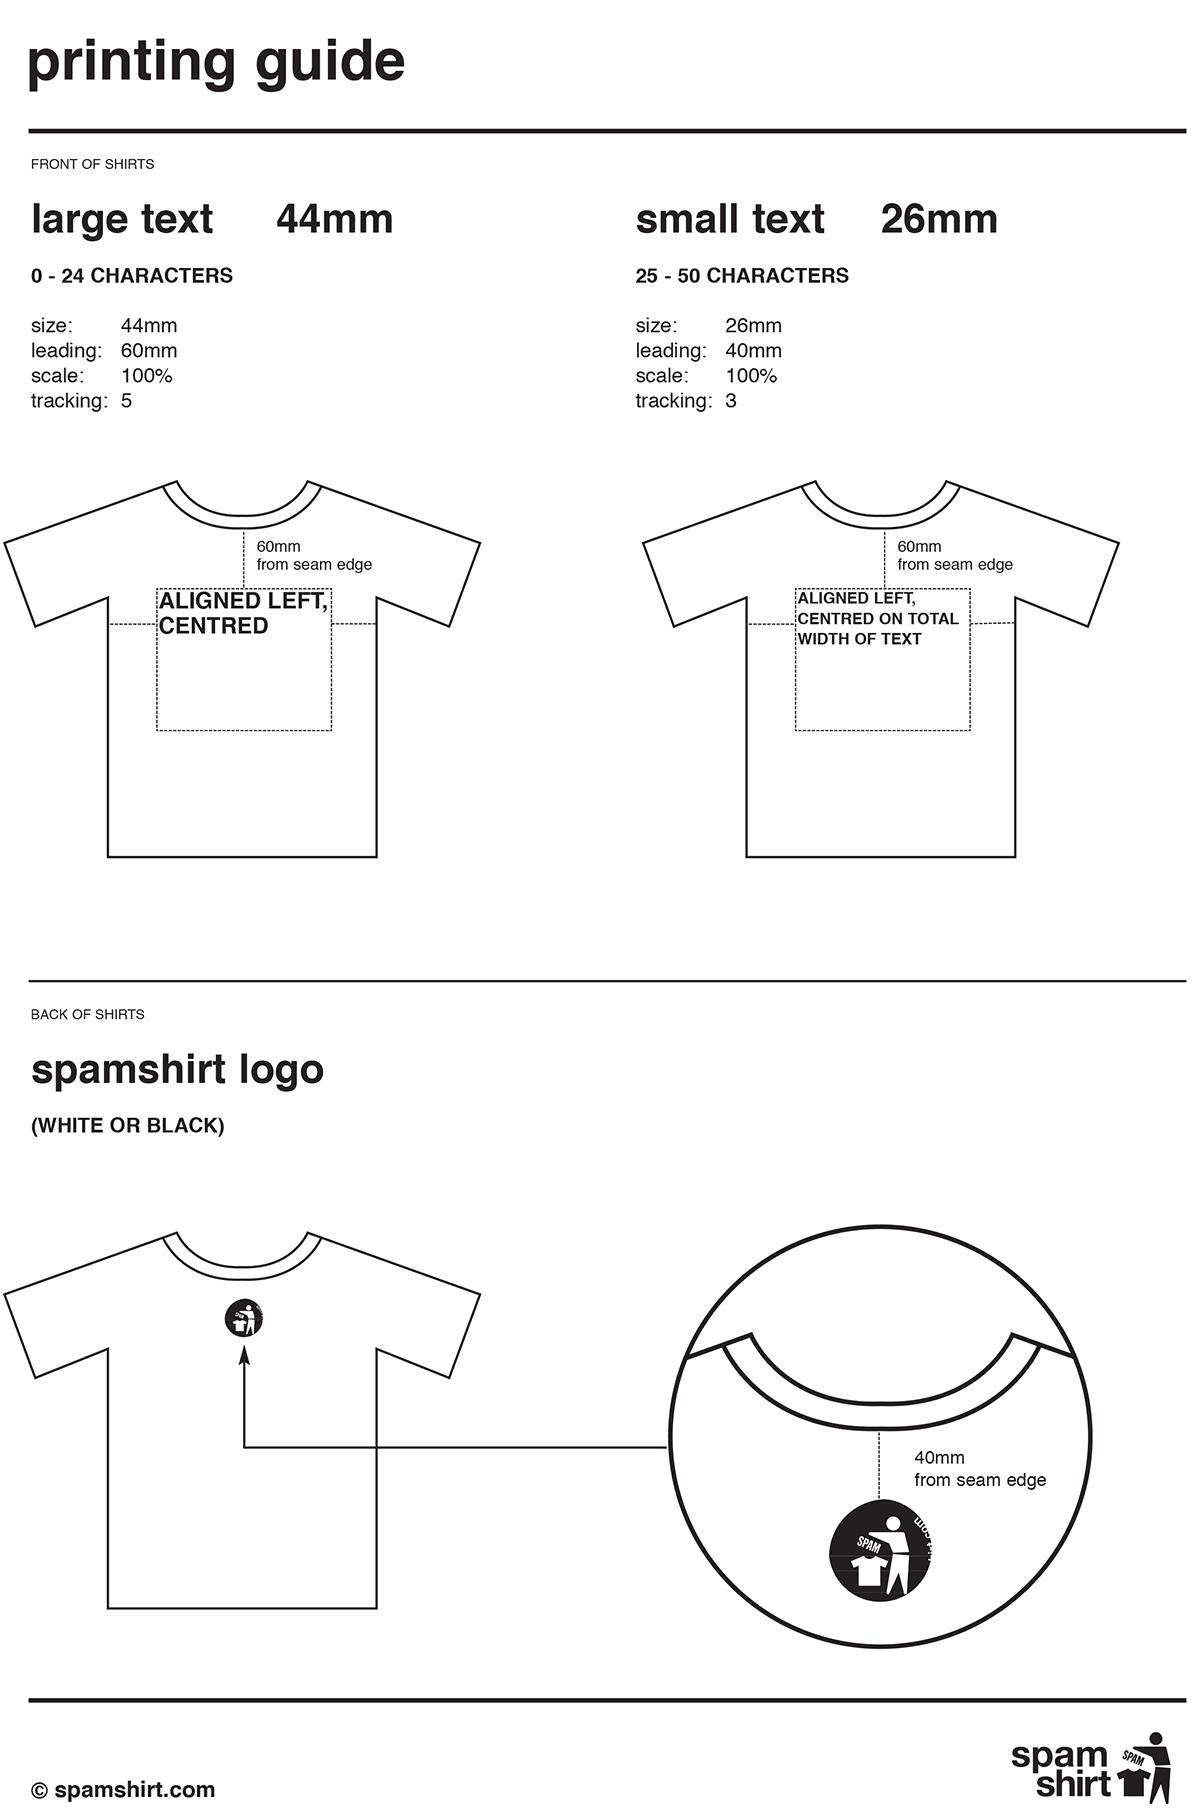 shirt_guide.Q